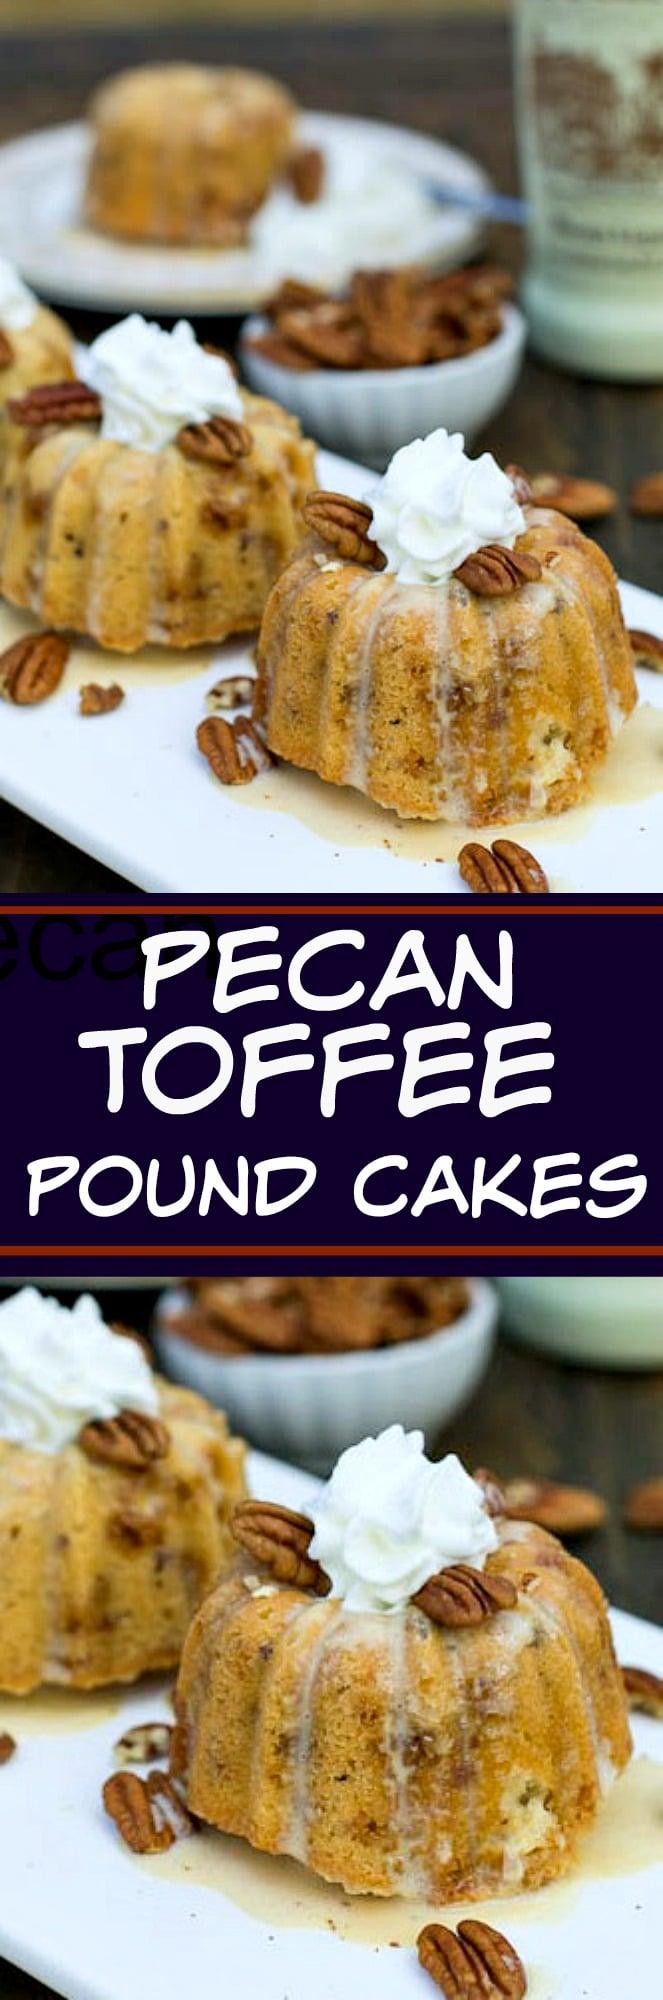 Mini Pecan Toffee Pound Cakes with Praline Creme Anglaise